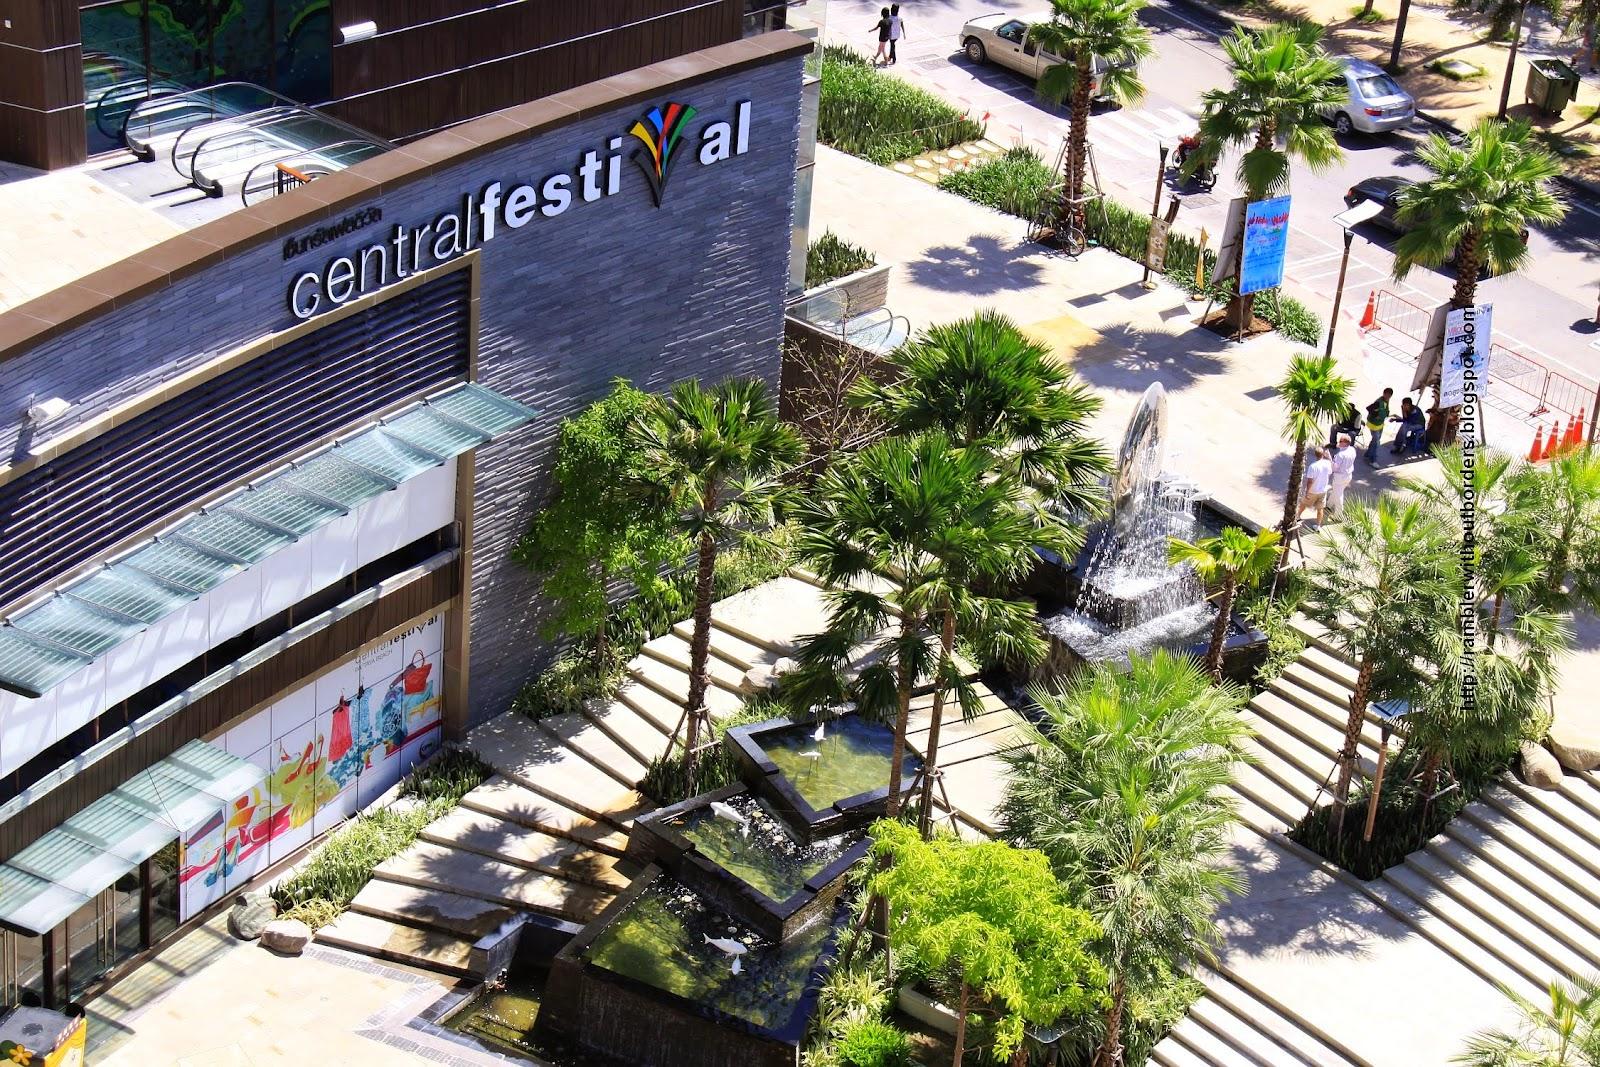 Central Festival shopping mall, Pattaya, Thailand